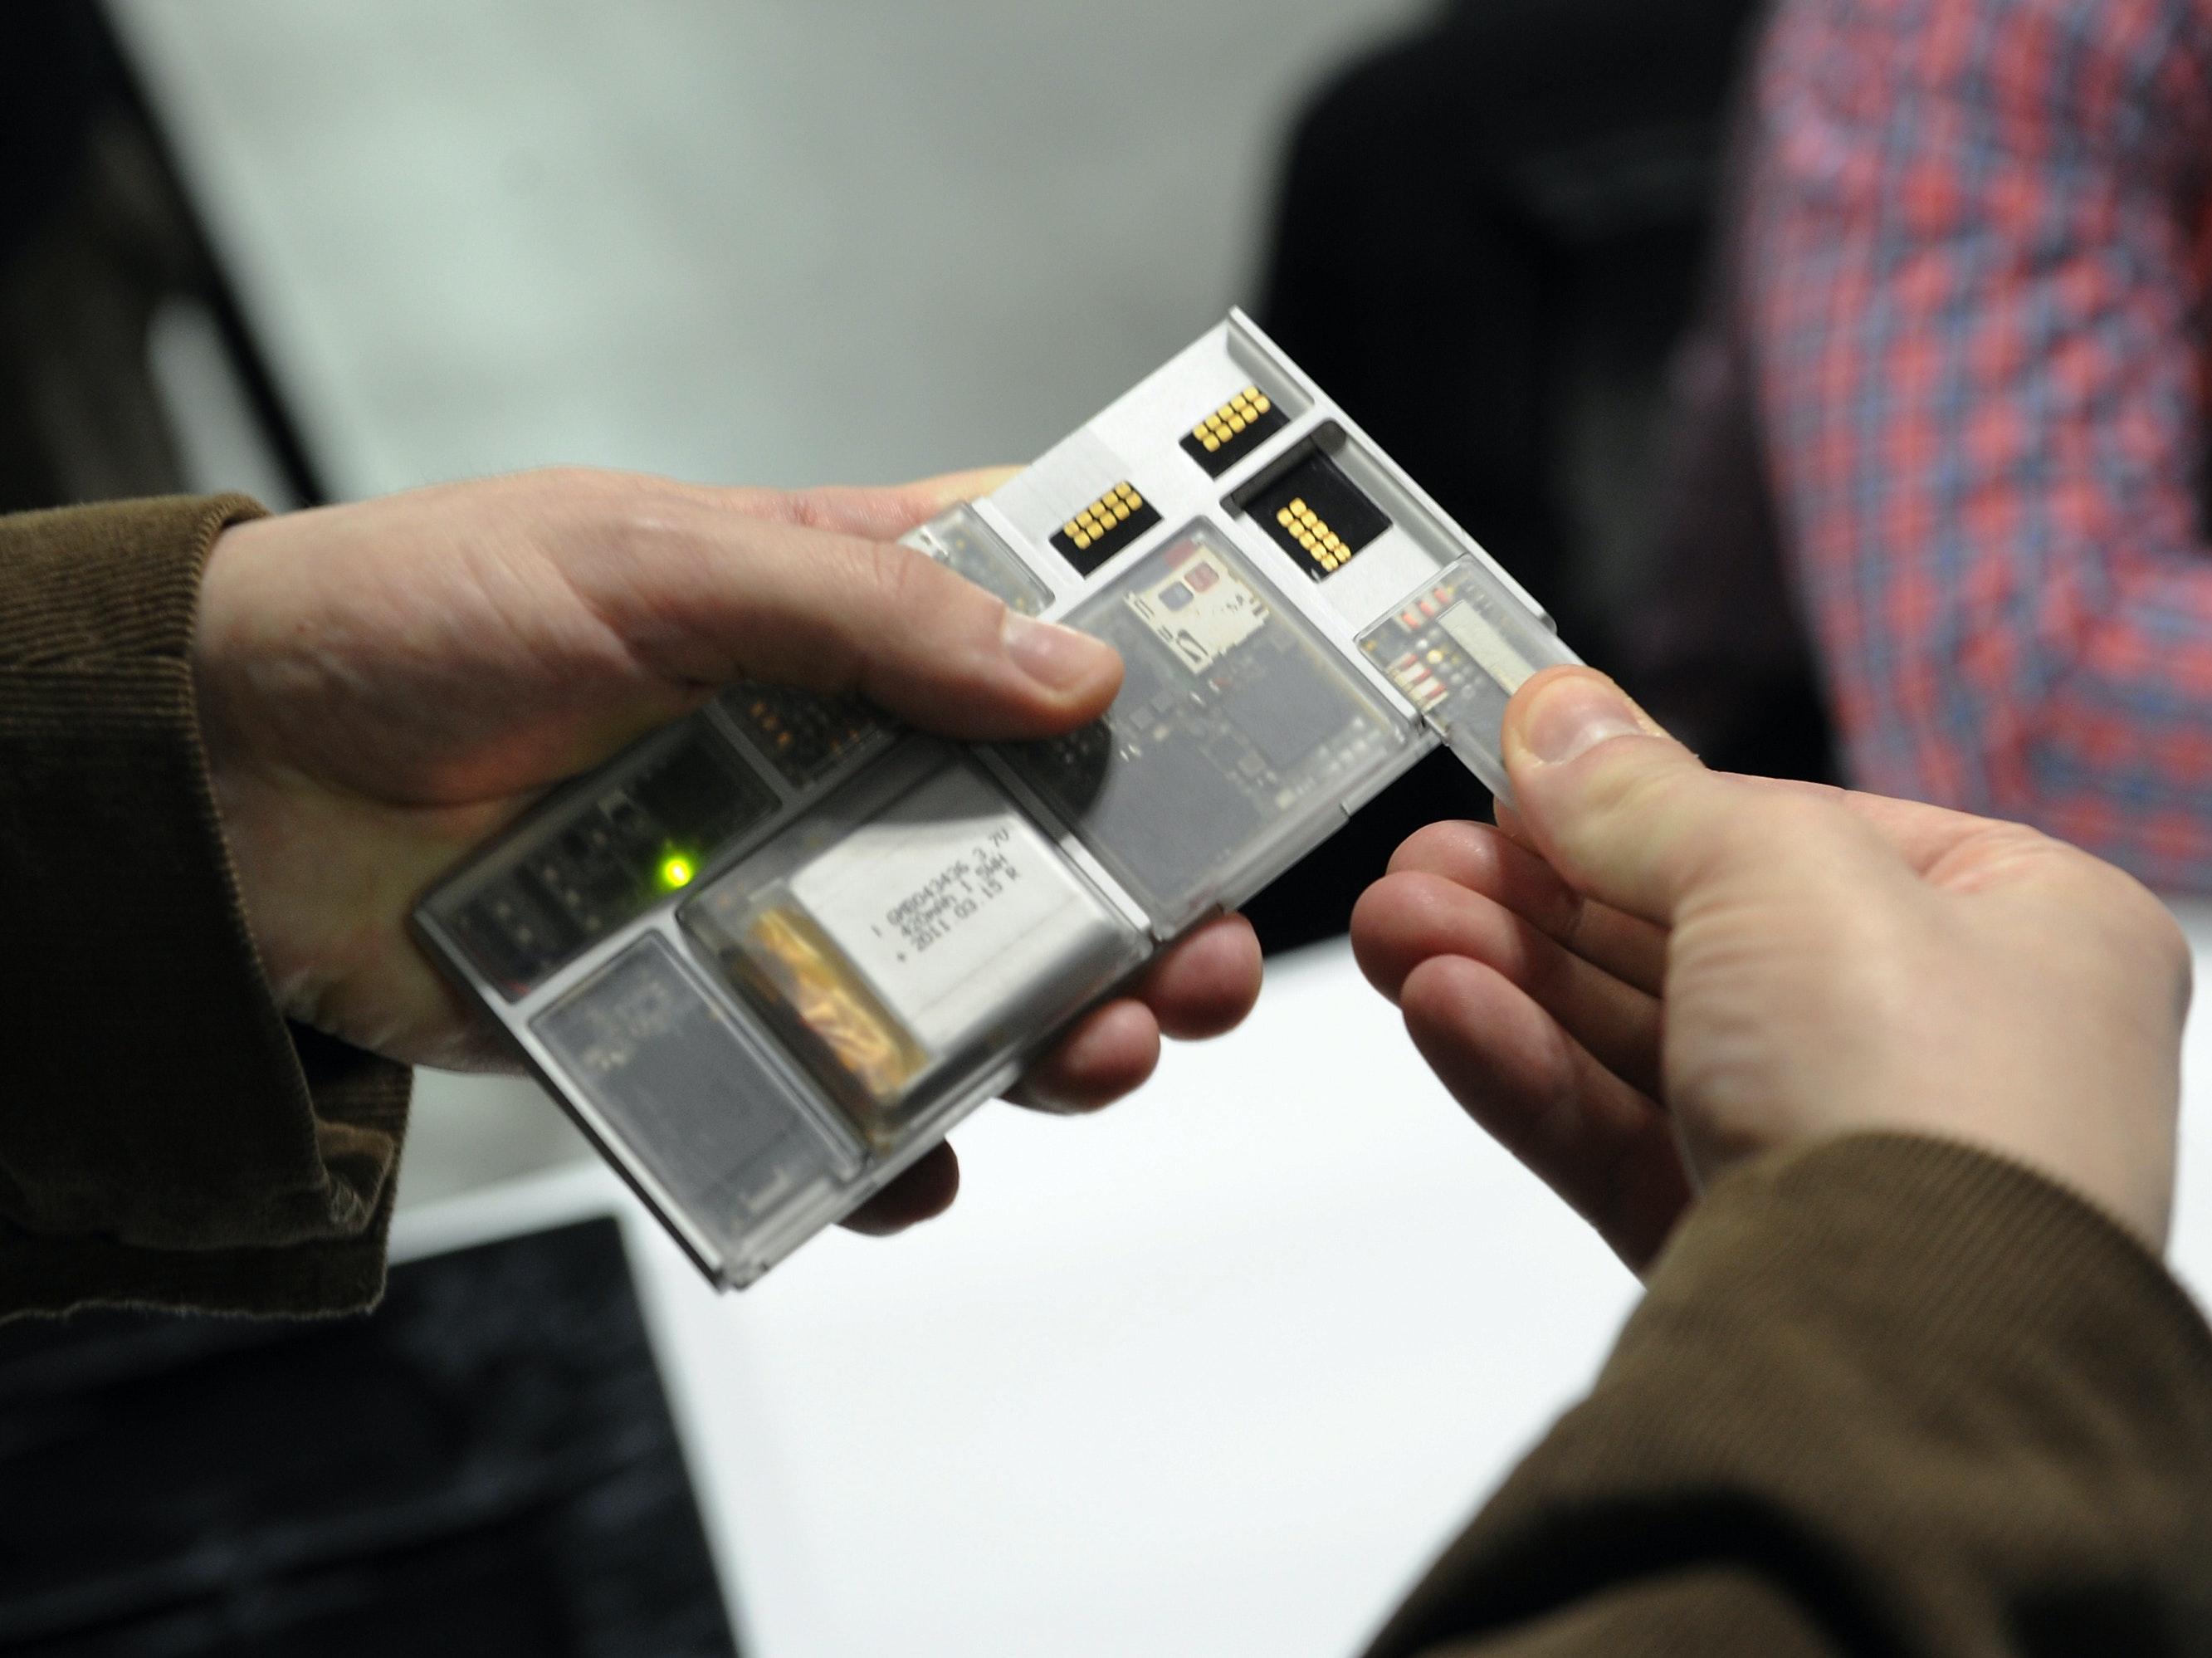 Report: Project Ara, Google's Modular Phone, Has Been Canceled